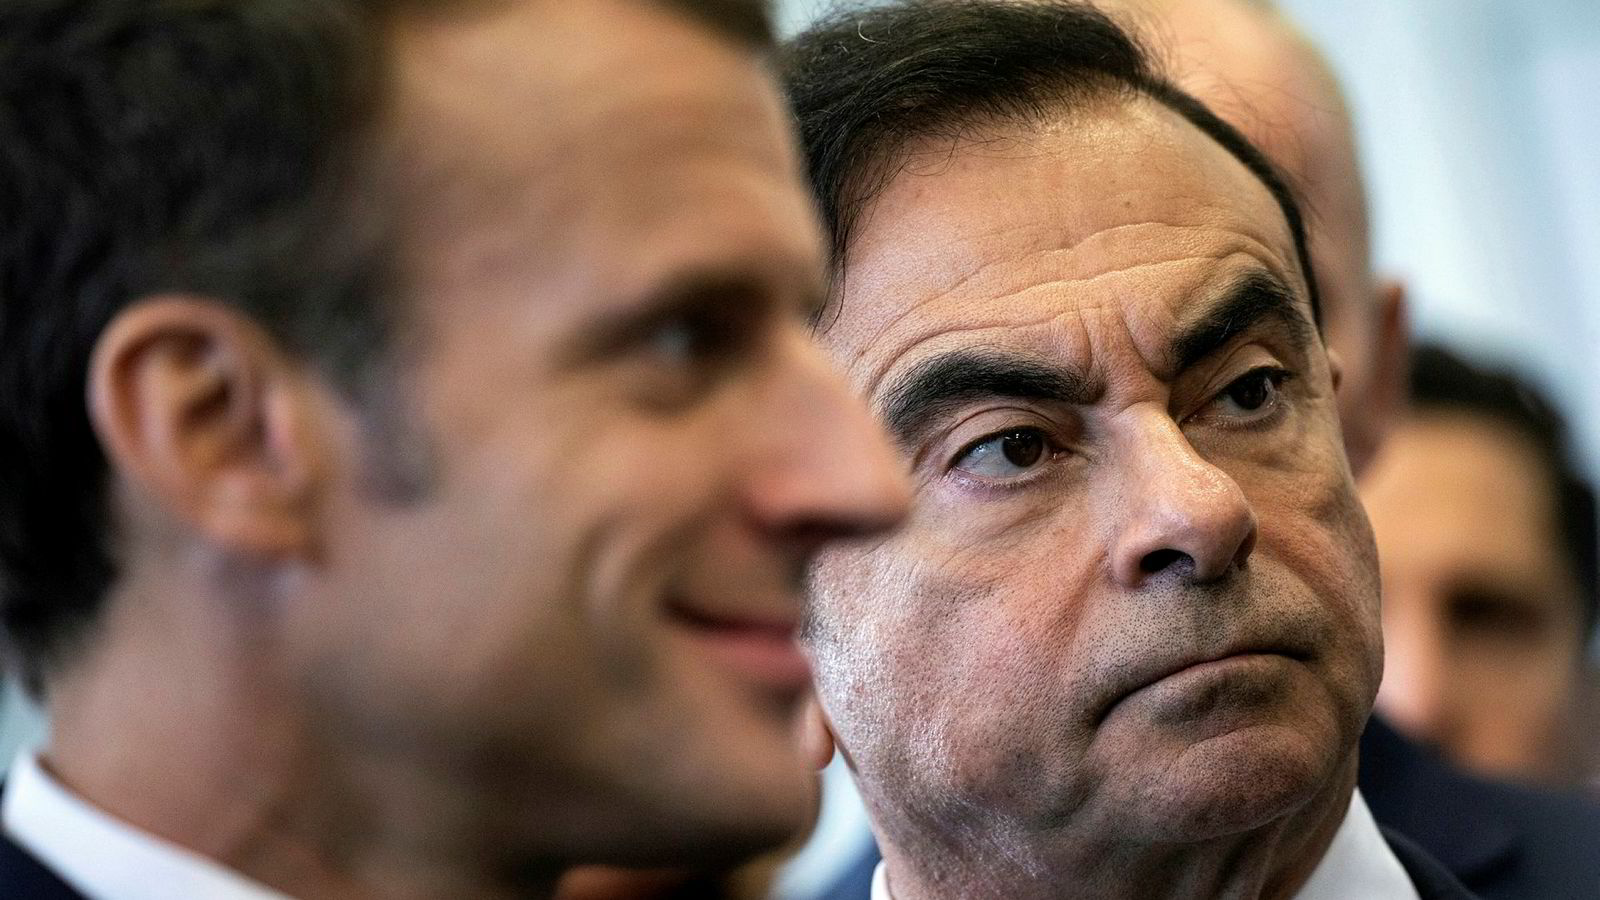 Frankrikes president Emmanuel Macron ønsker en sammenslåing, etter at Renault-sjef Carlos Ghosn (til høyre) ble arrestert. Her under et tidligere besøk ved Renault-fabrikken i Maubeuge.